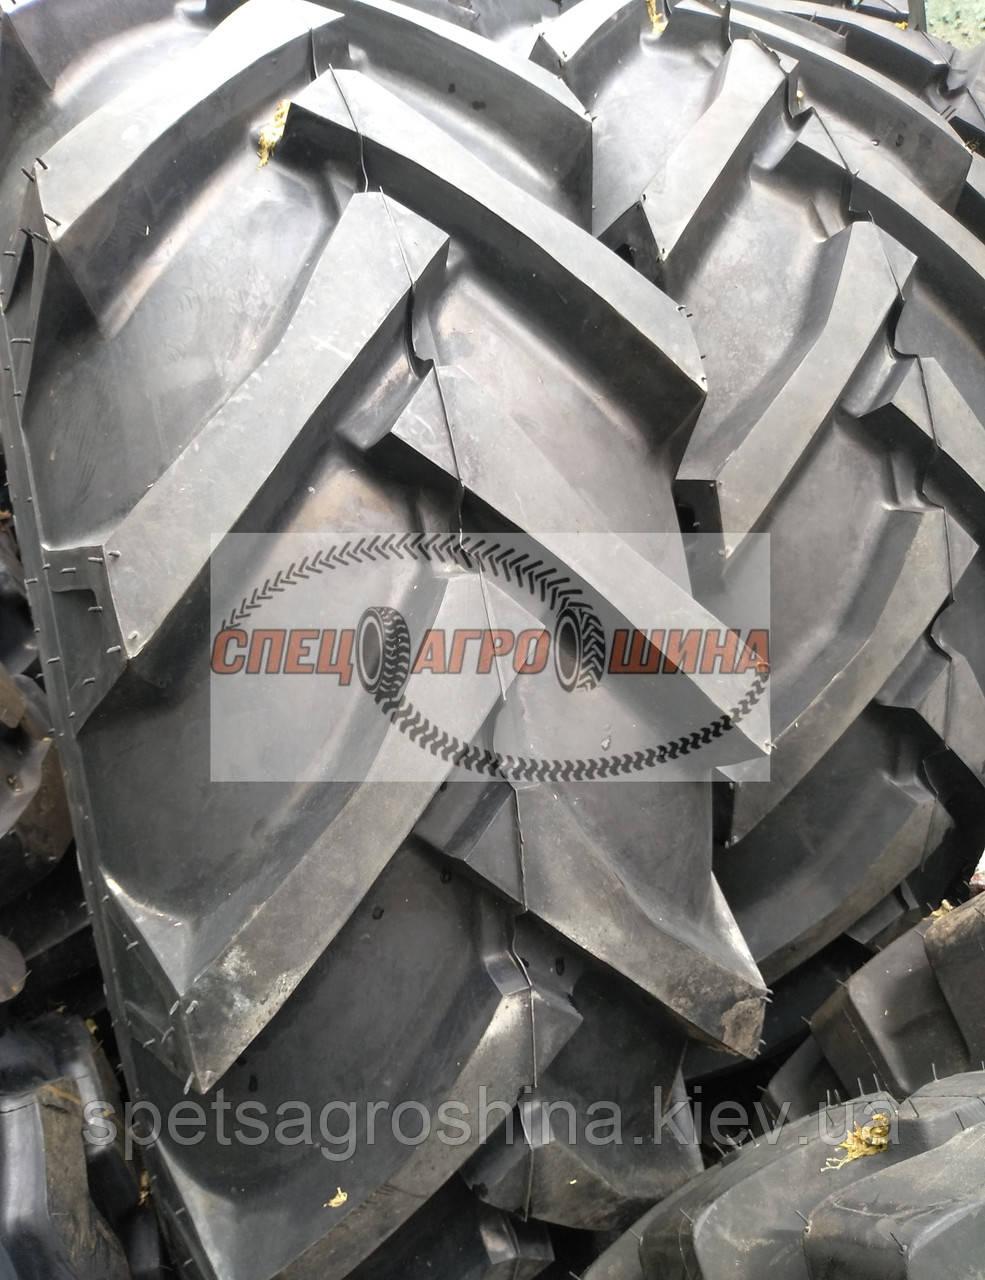 Шина 15.5/80-24 (400/80-24) 16PR R1 TL Armour